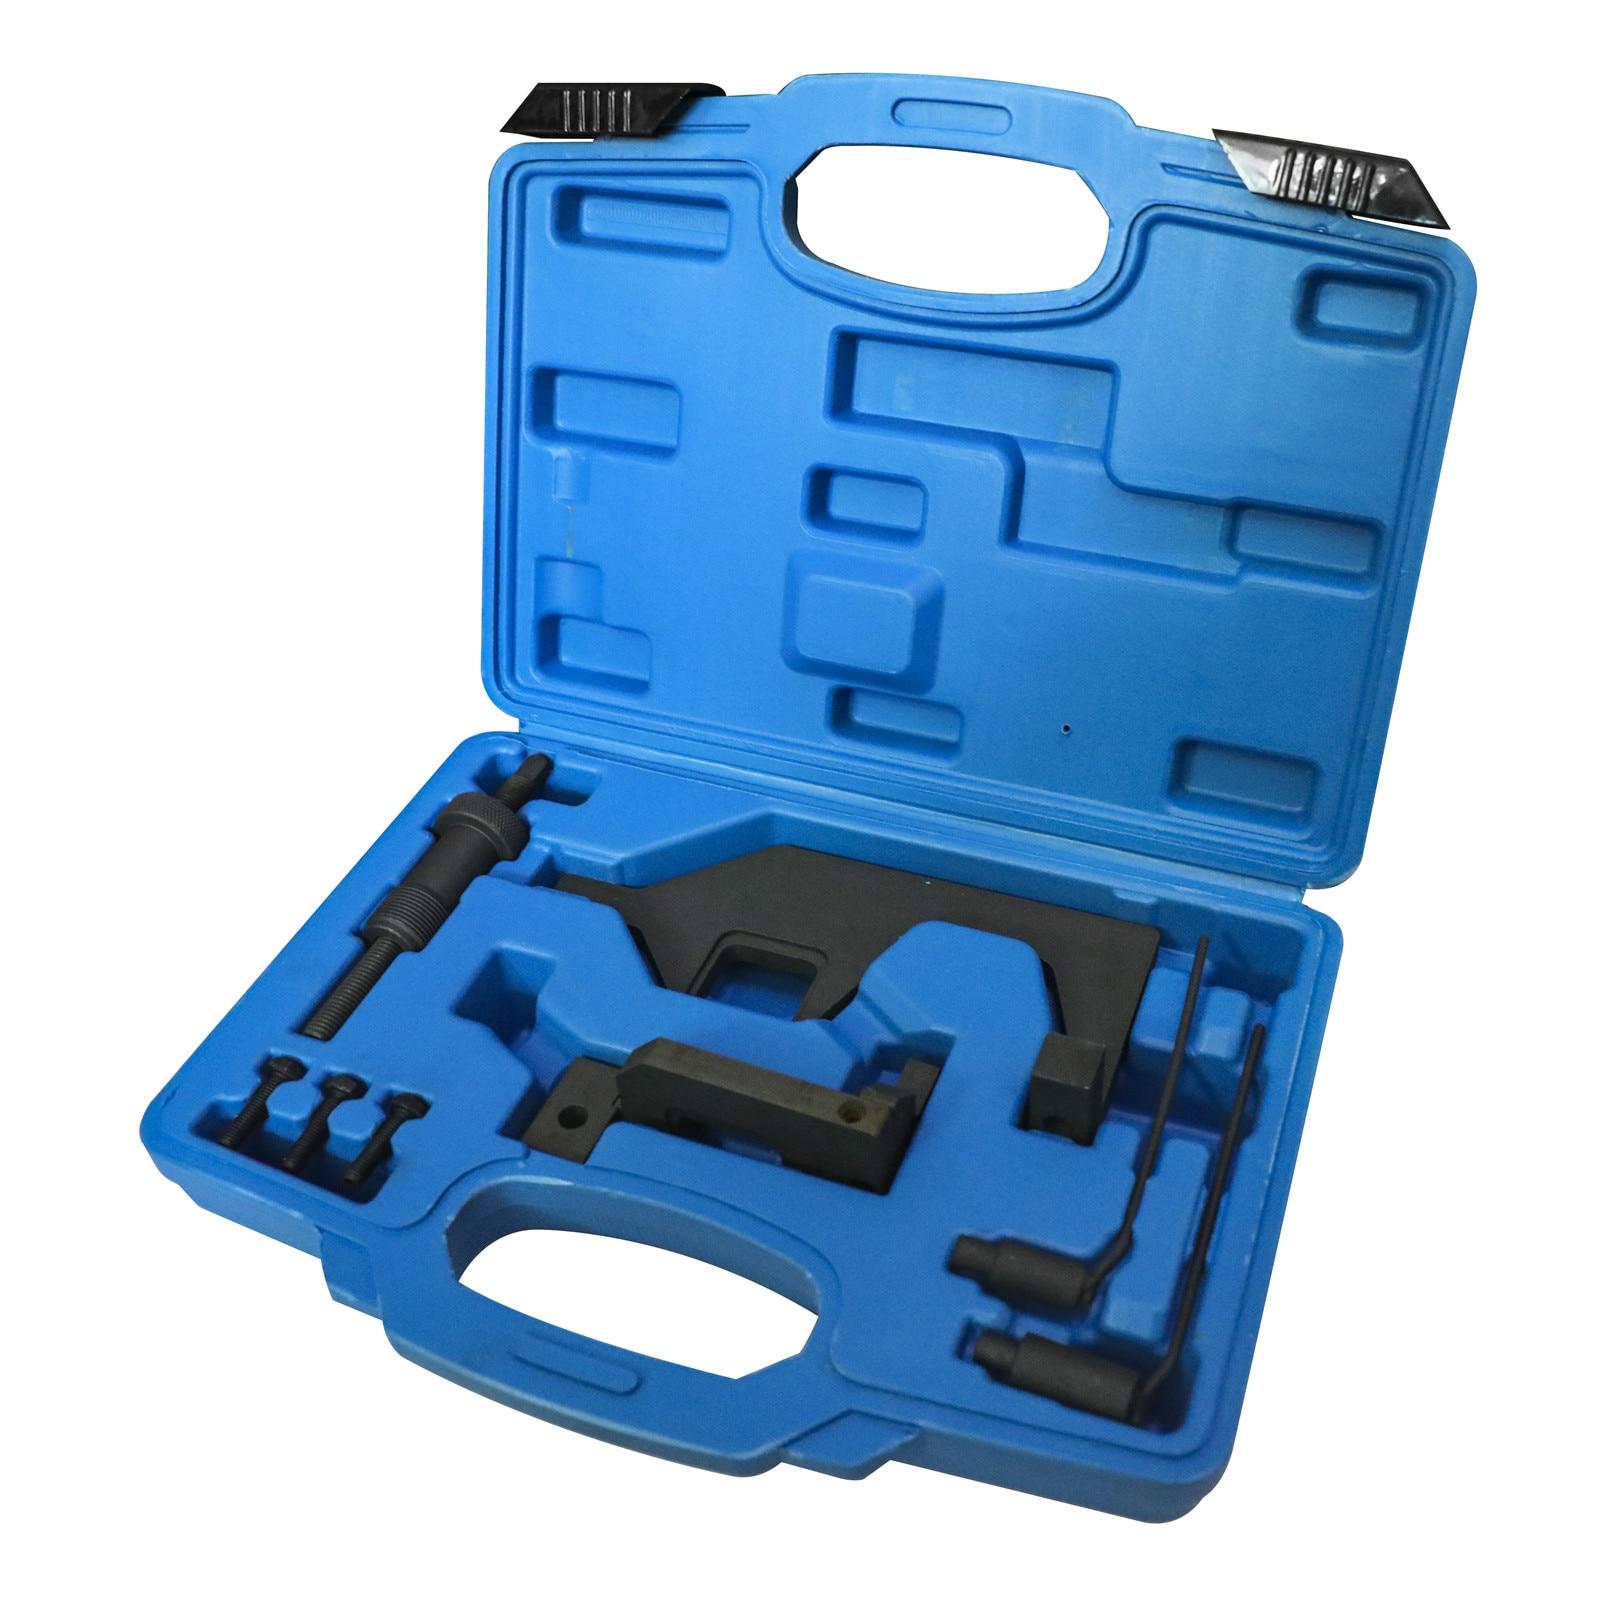 Conjunto de ferramentas sincronismo do motor para bmw mini cooper clubman n13, n18, f20 14i 16i 18i f30 2.0